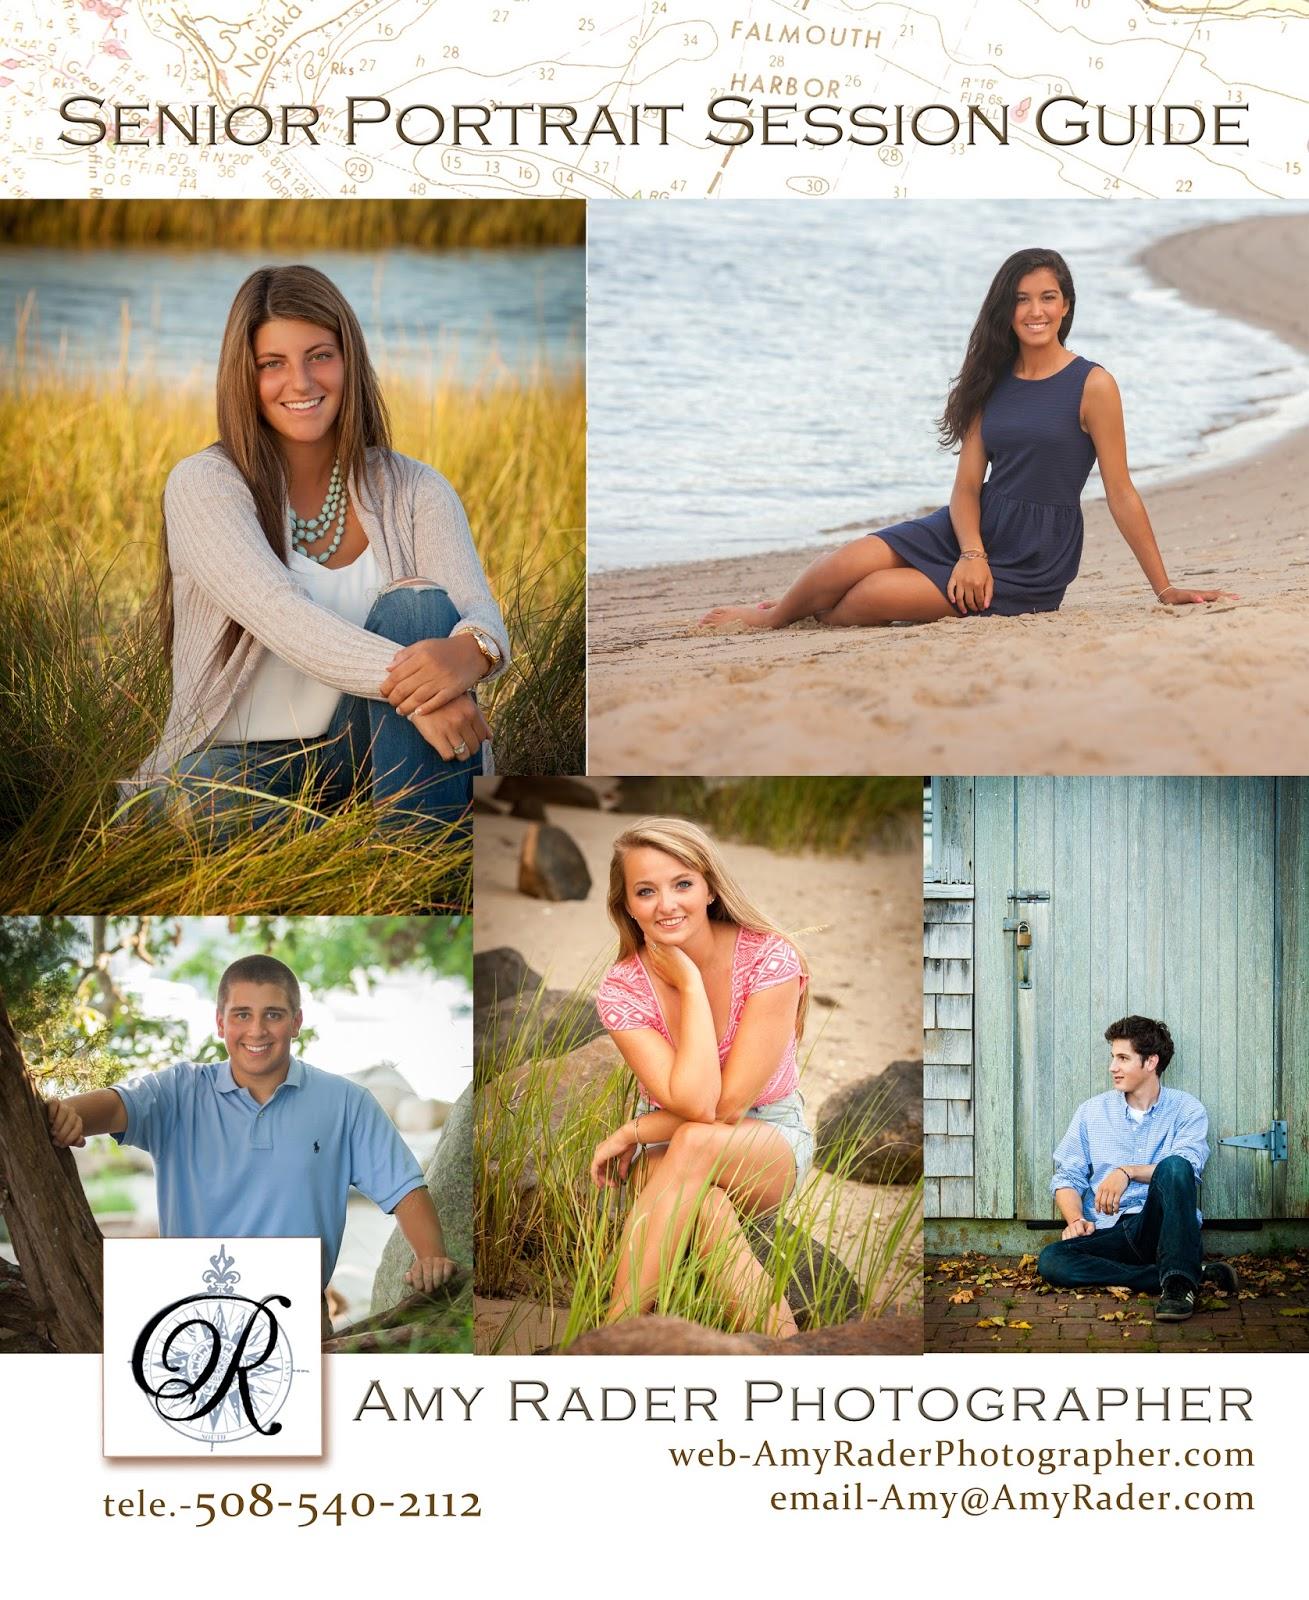 Amy Rader Photographer: 2019 High School Senior Portrait Pricing